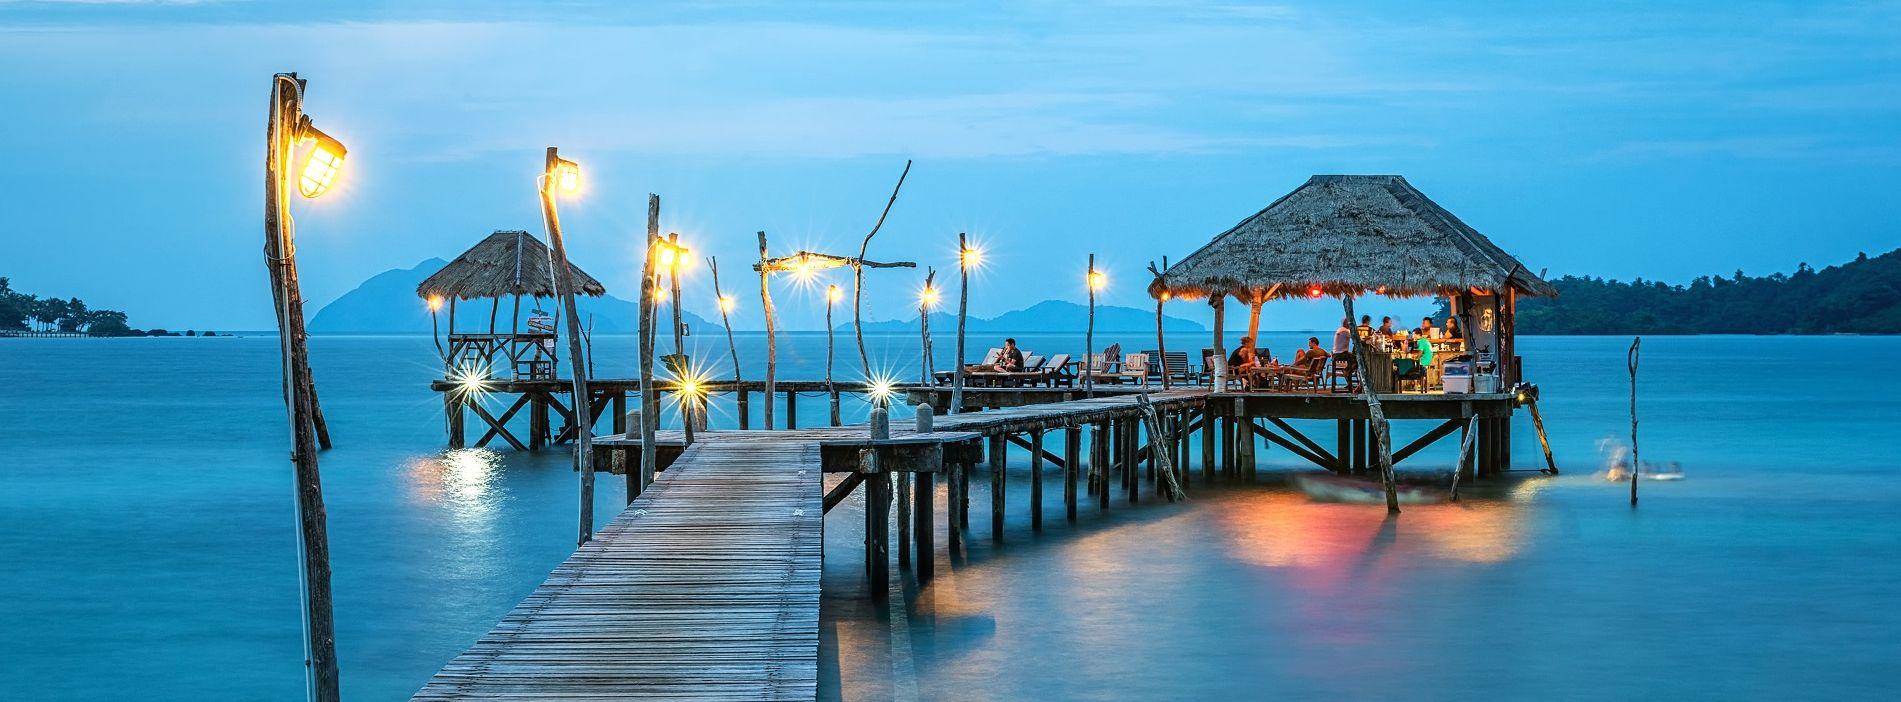 beach-caribbean-jetty-1901x702